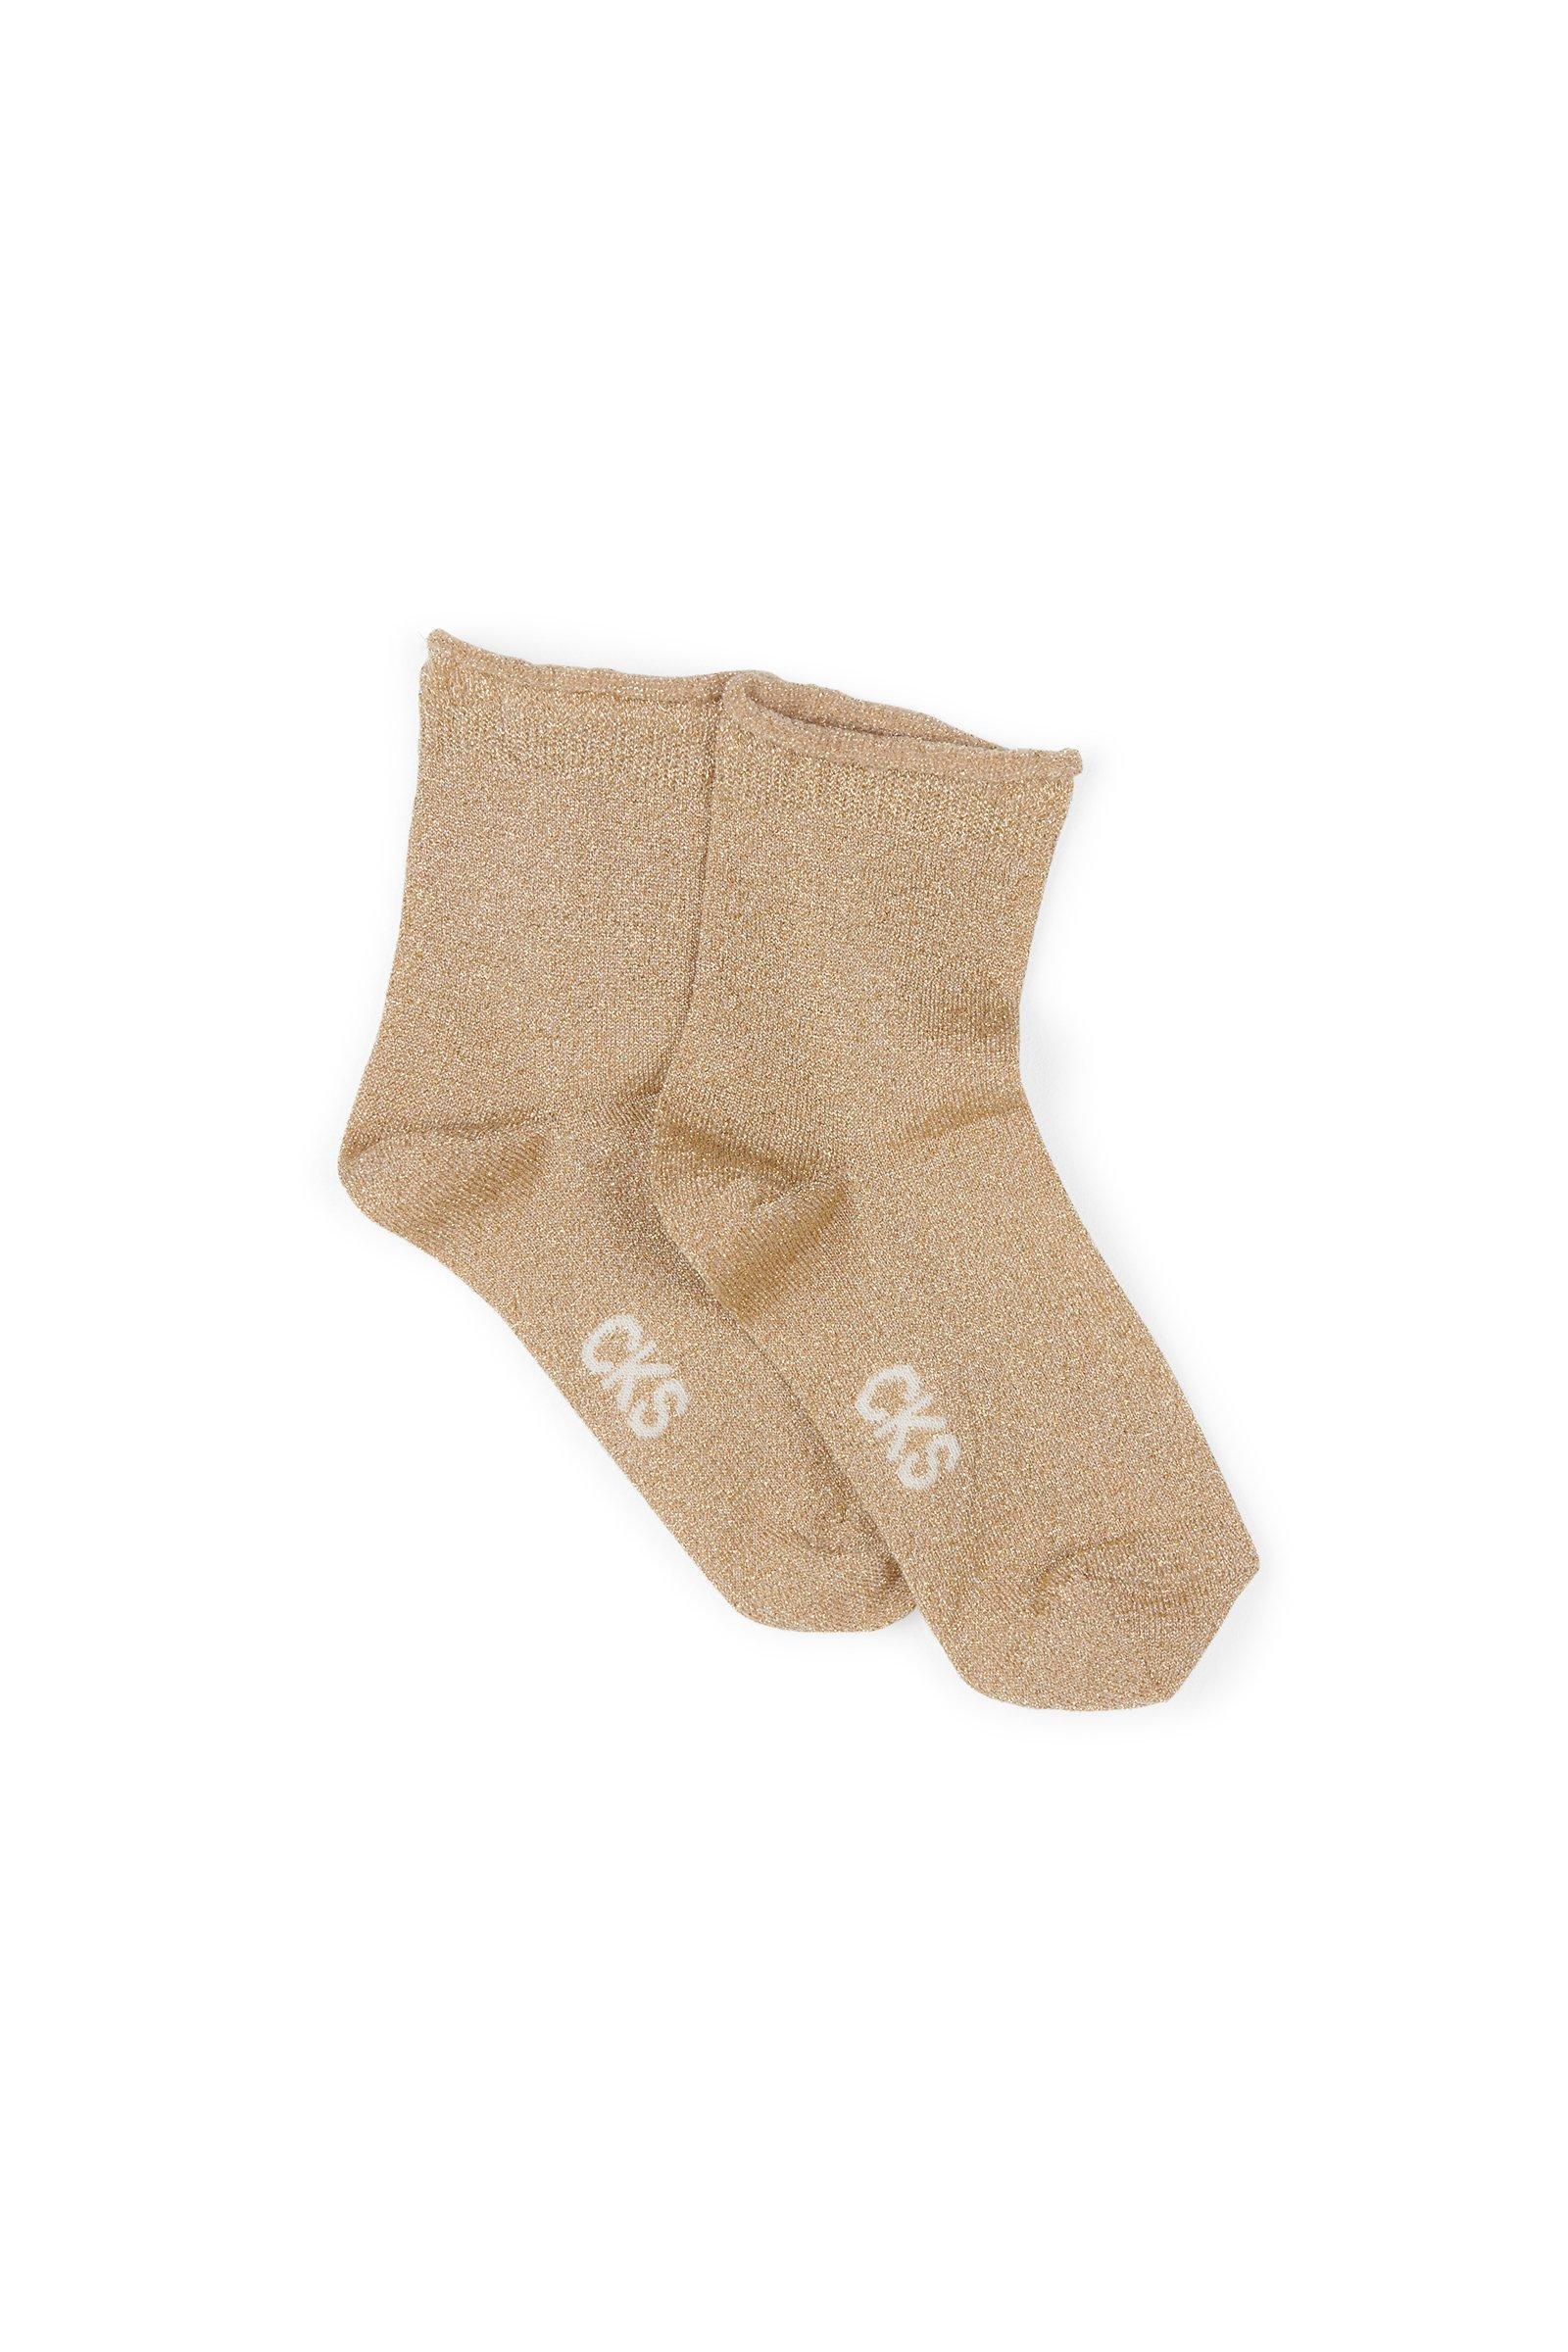 CKS Kids - LUREXI - sokken - geel